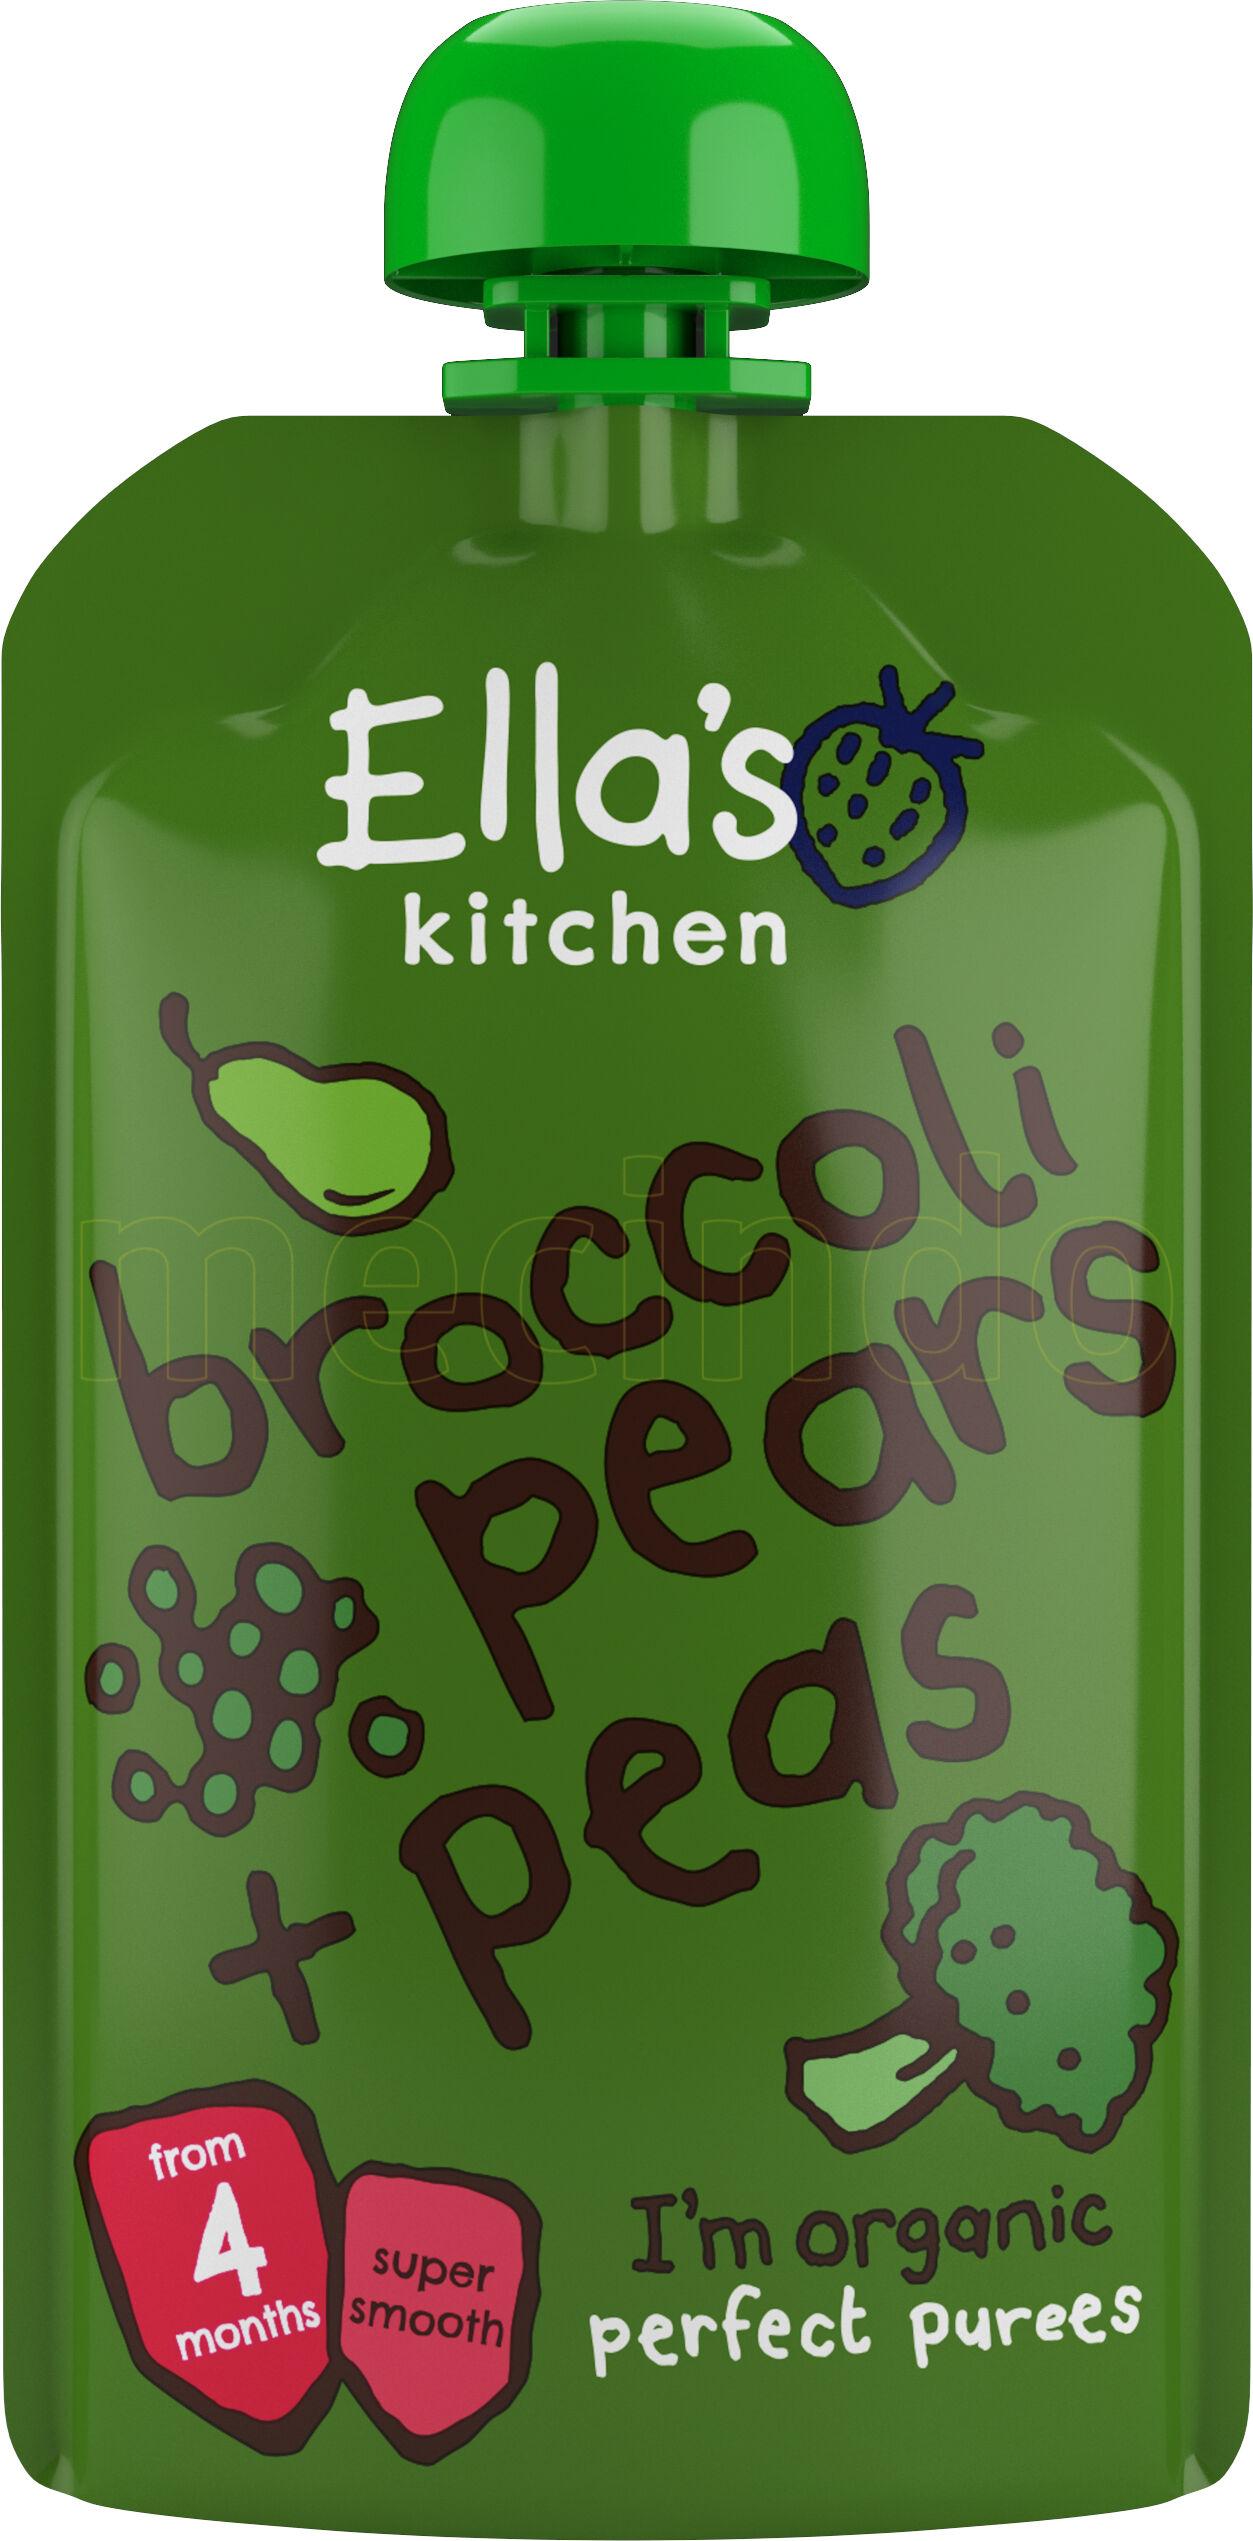 Ellas Kitchen S1 Brokkoli, Pære & Erter 4 Mnd+ - 120 Gram